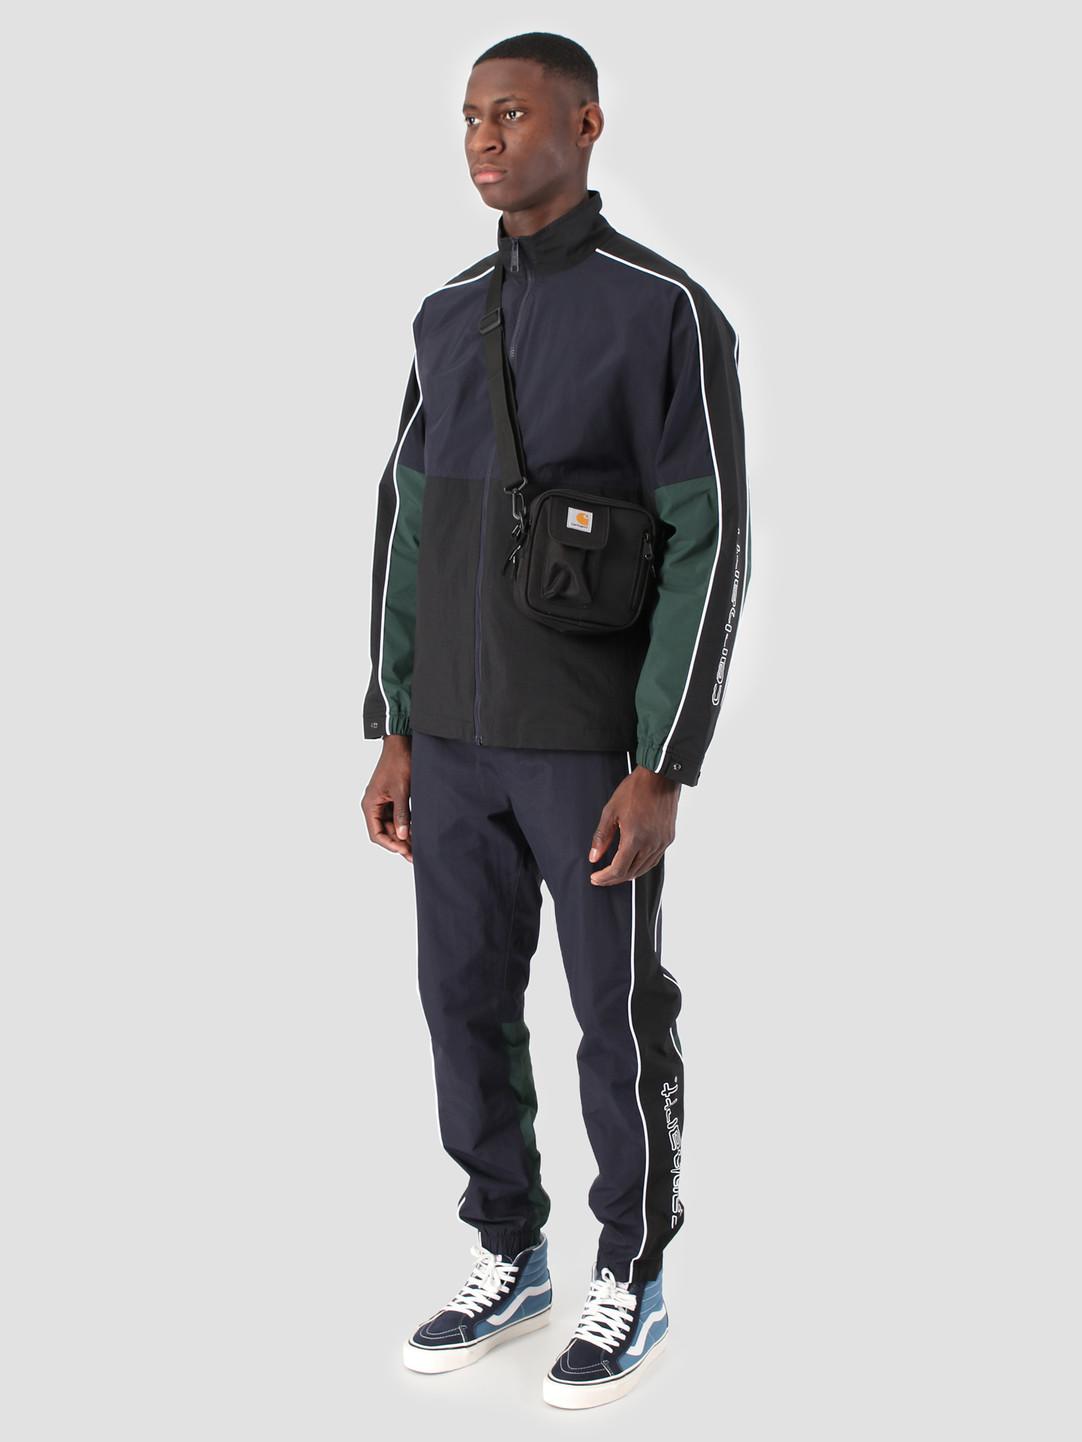 Carhartt WIP Carhartt WIP Terrace Jacket Dark Navy Black Bottle Green I026251